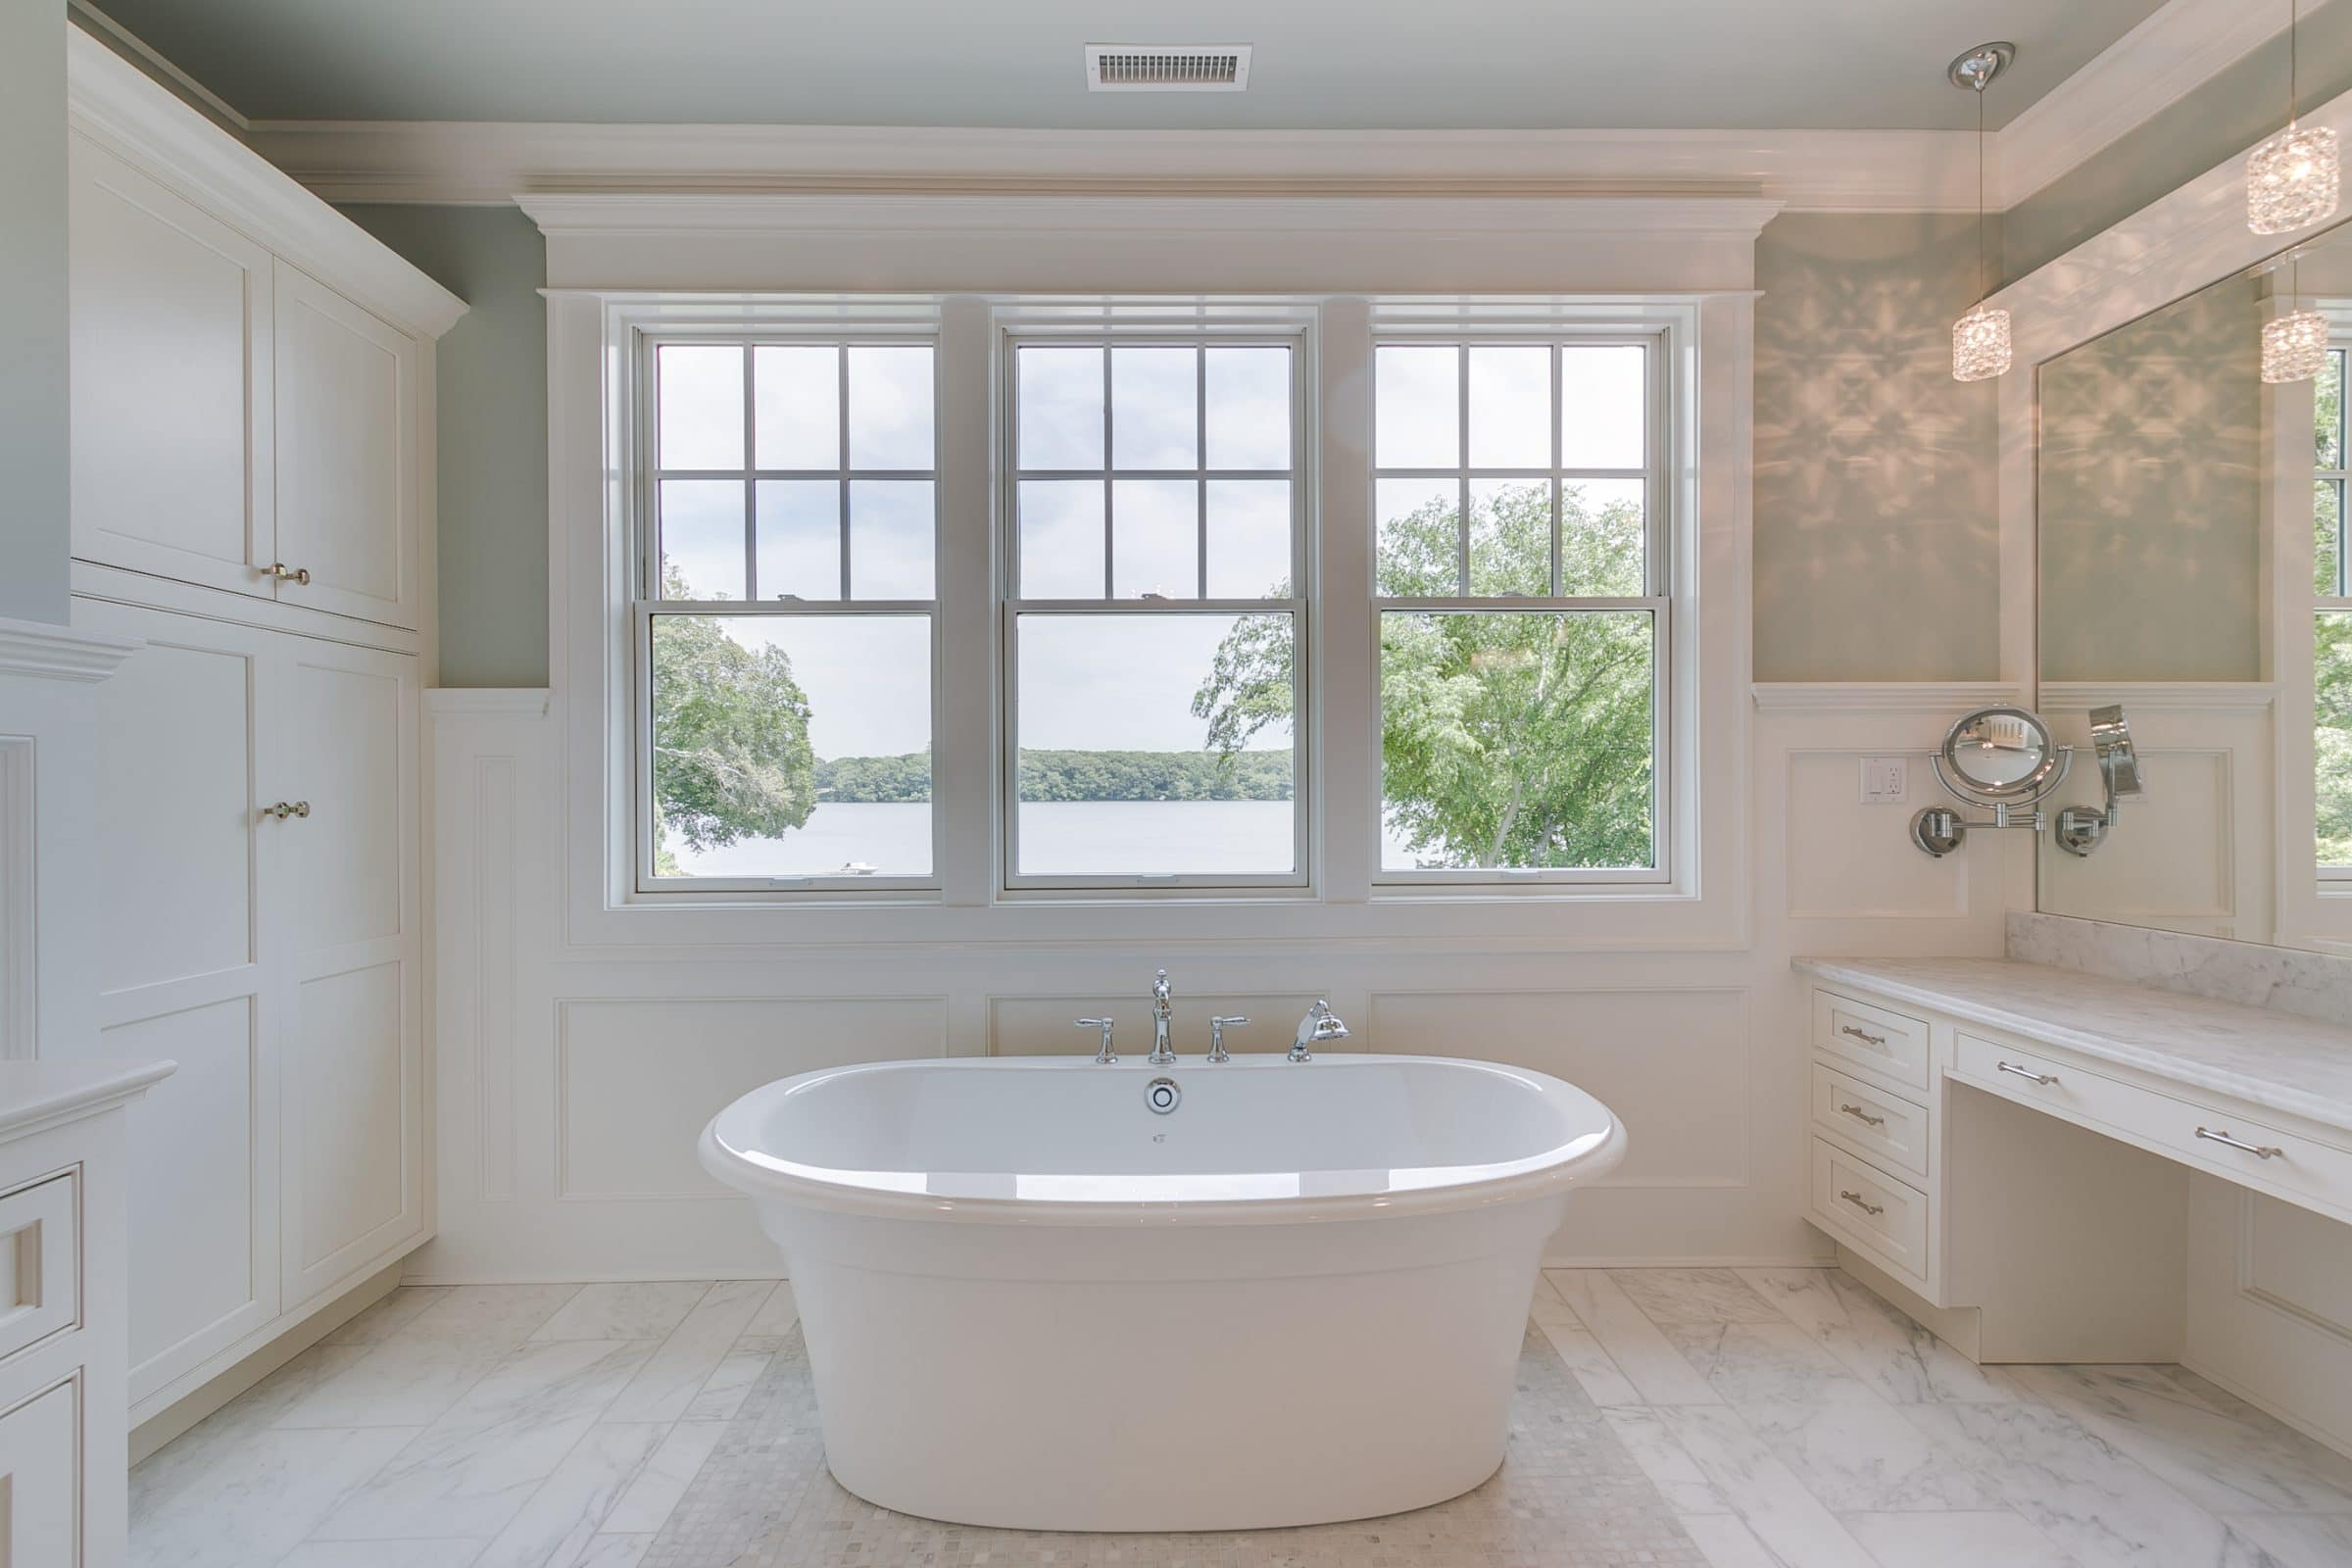 Full Size of Bathroom:custom Bathroom Designs Custom Bathroom Design Designs  Contemporary Small Spaces Ima ...